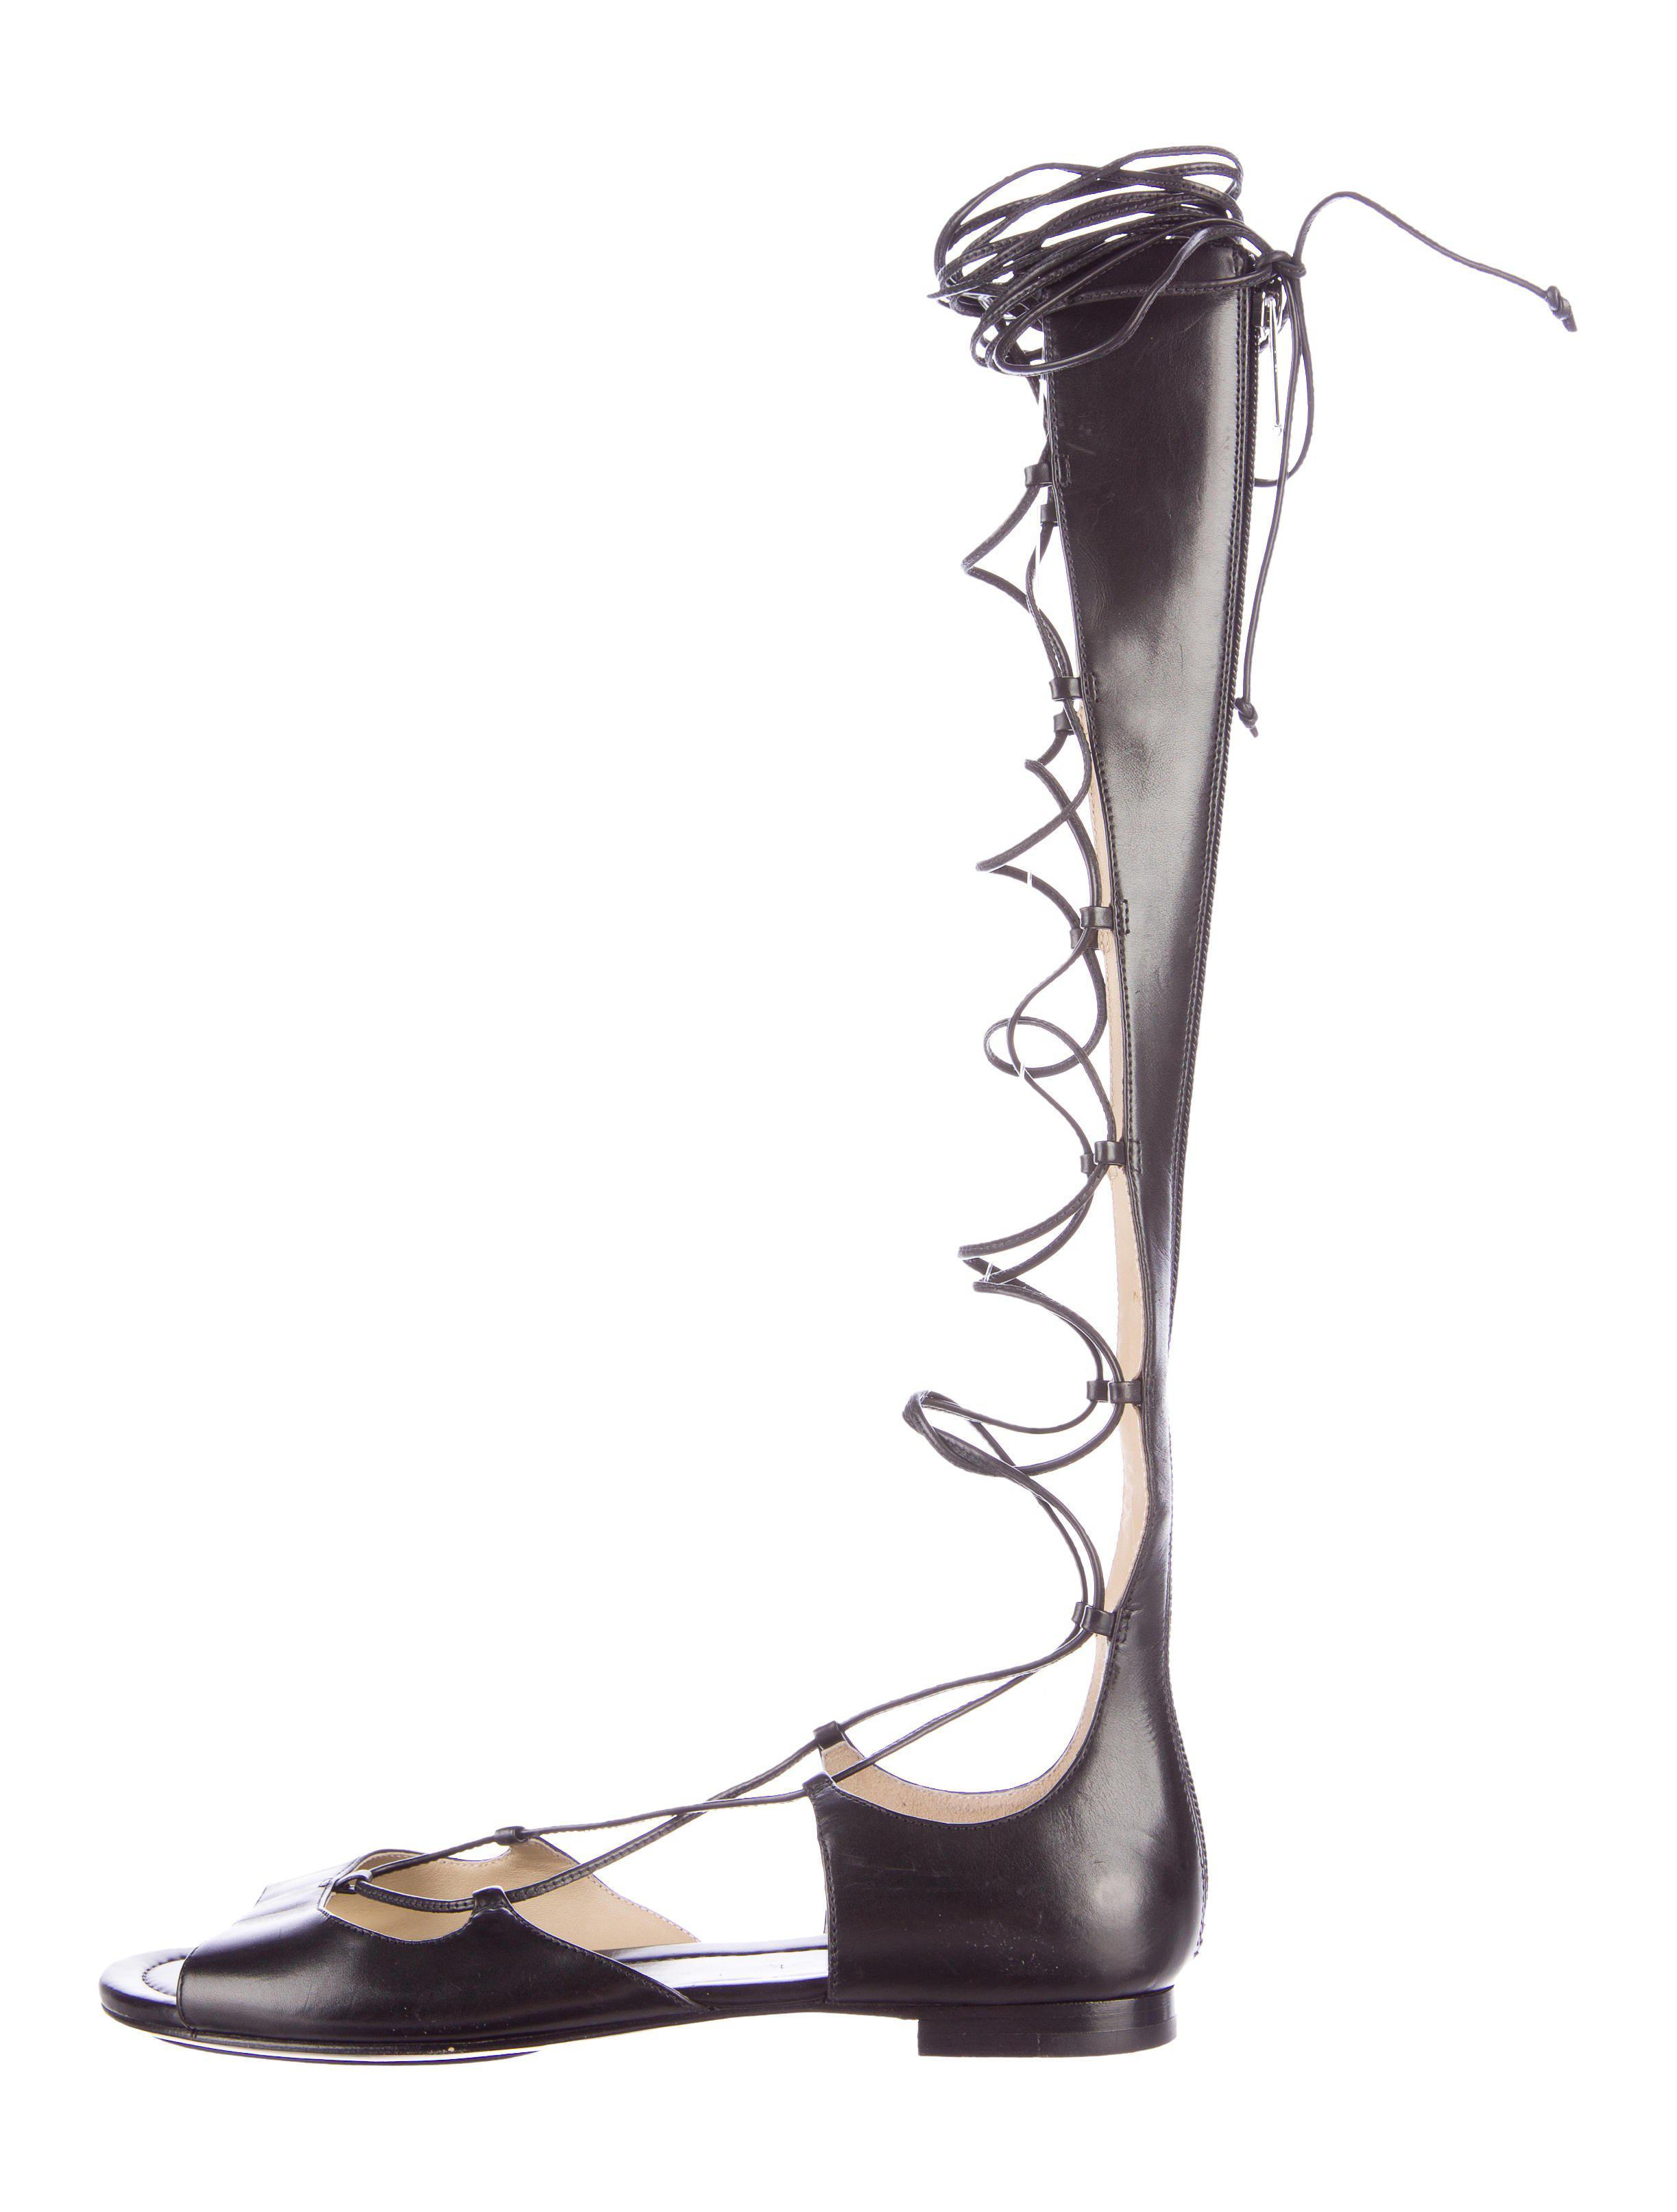 baeca2dc78e4 Lyst - Michael Kors Birdie Gladiator Sandals in Black